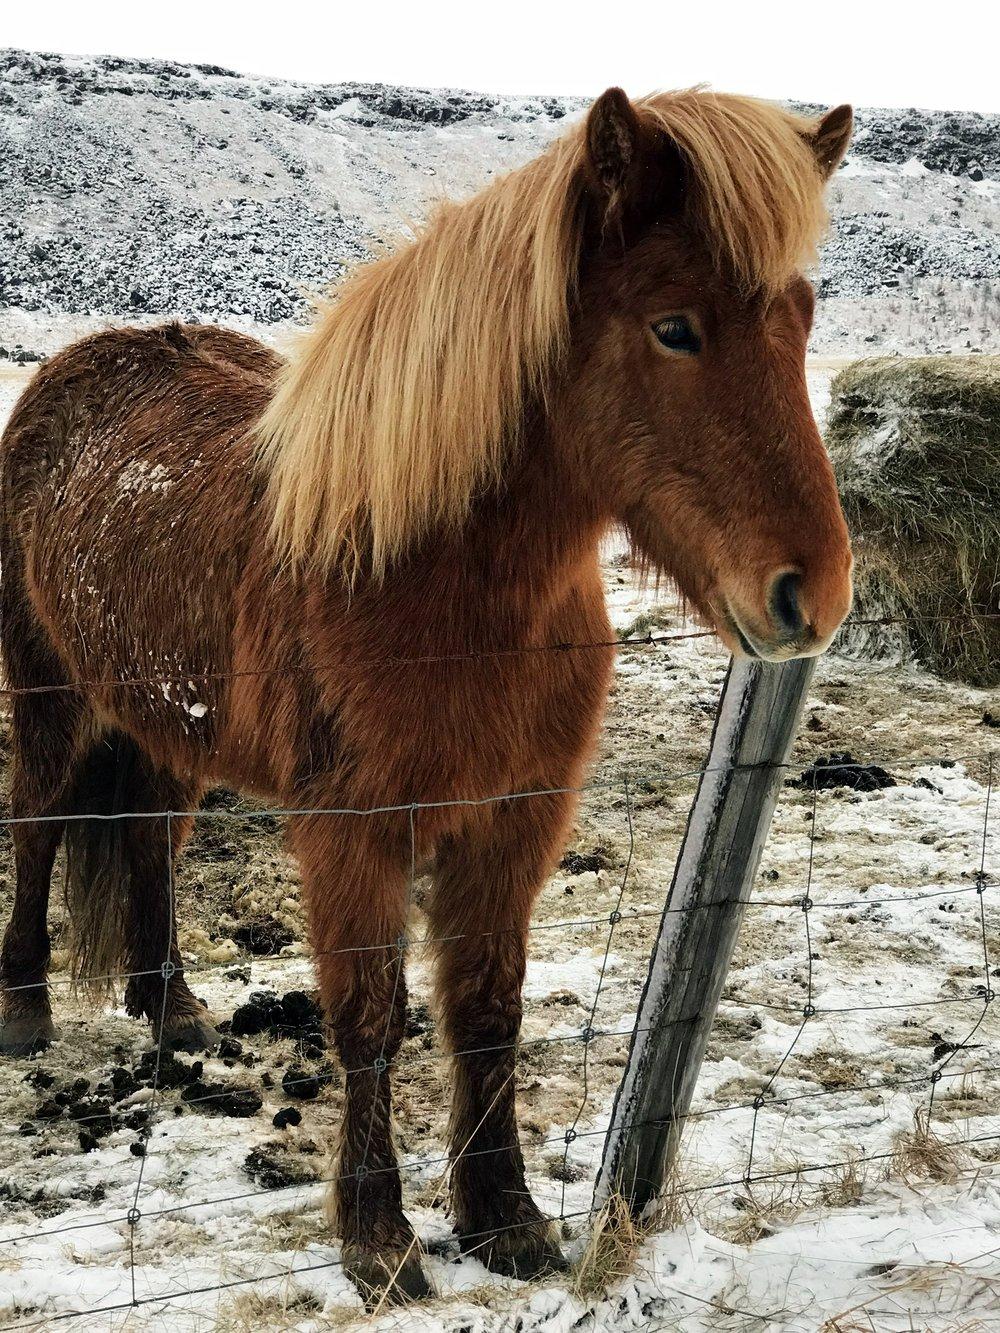 Sweet Icelandic horses